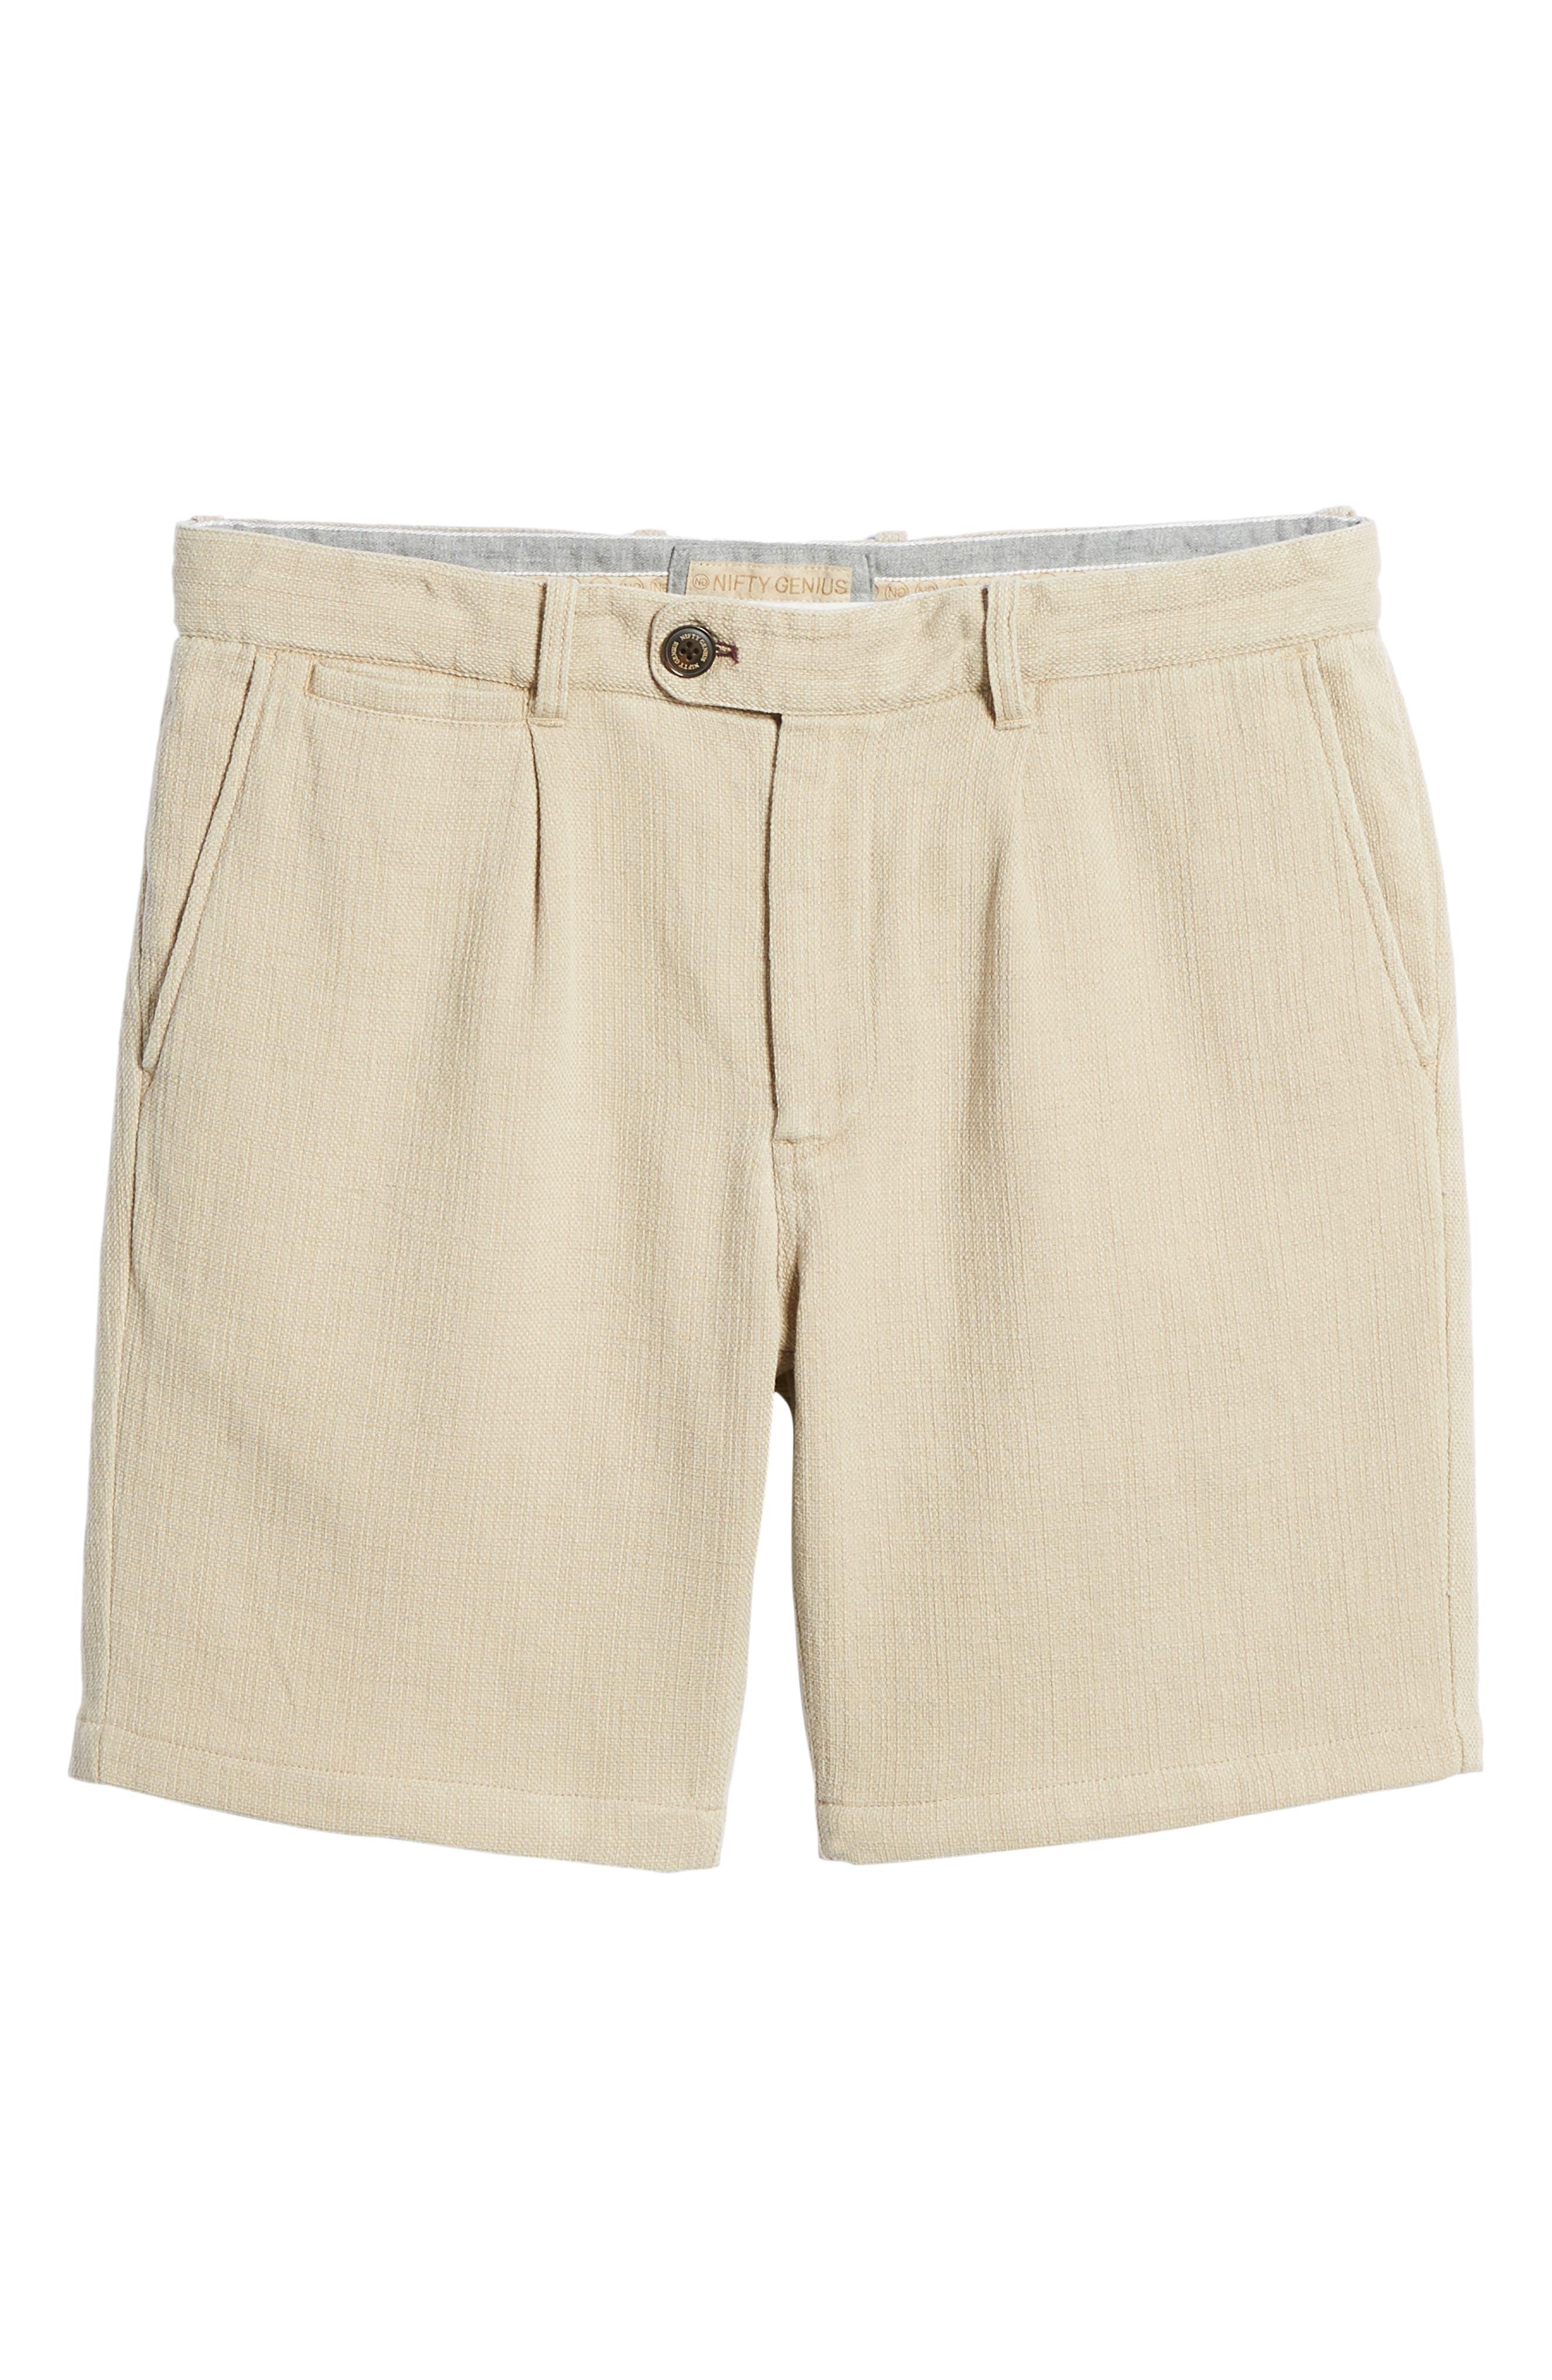 Thomas Regular Fit Pleated Shorts,                             Alternate thumbnail 6, color,                             250